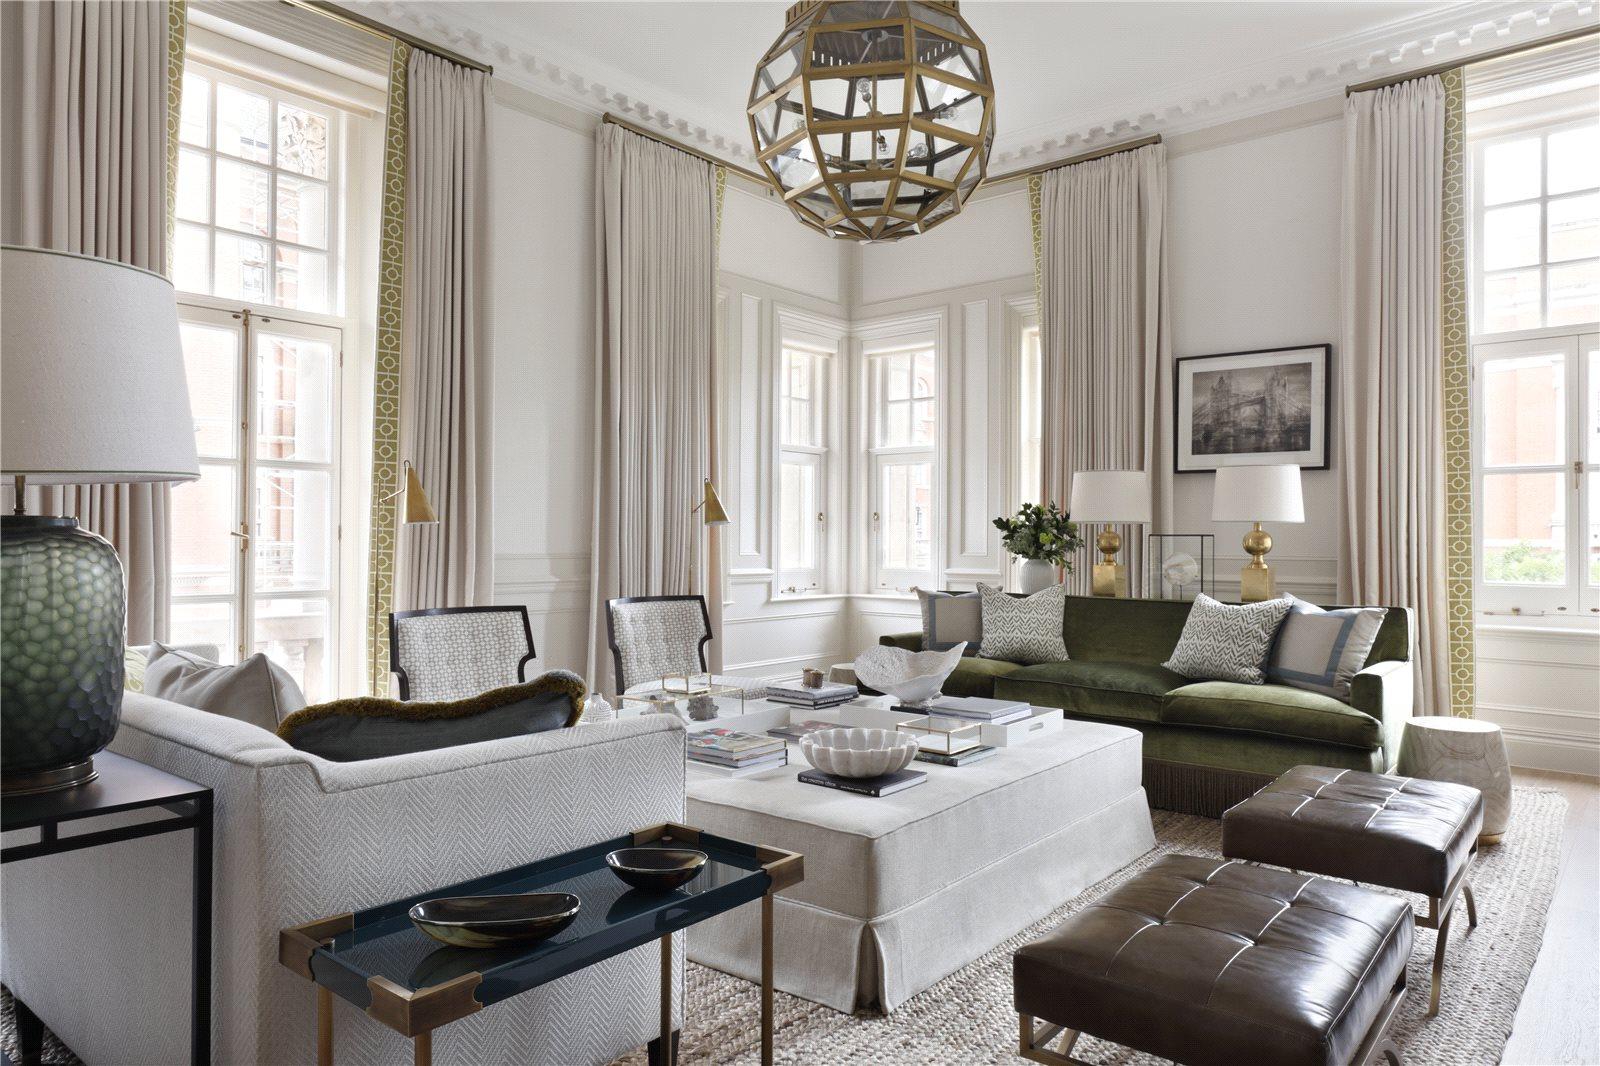 公寓 为 销售 在 Albert Court, Prince Consort Road, London, SW7 London, 英格兰